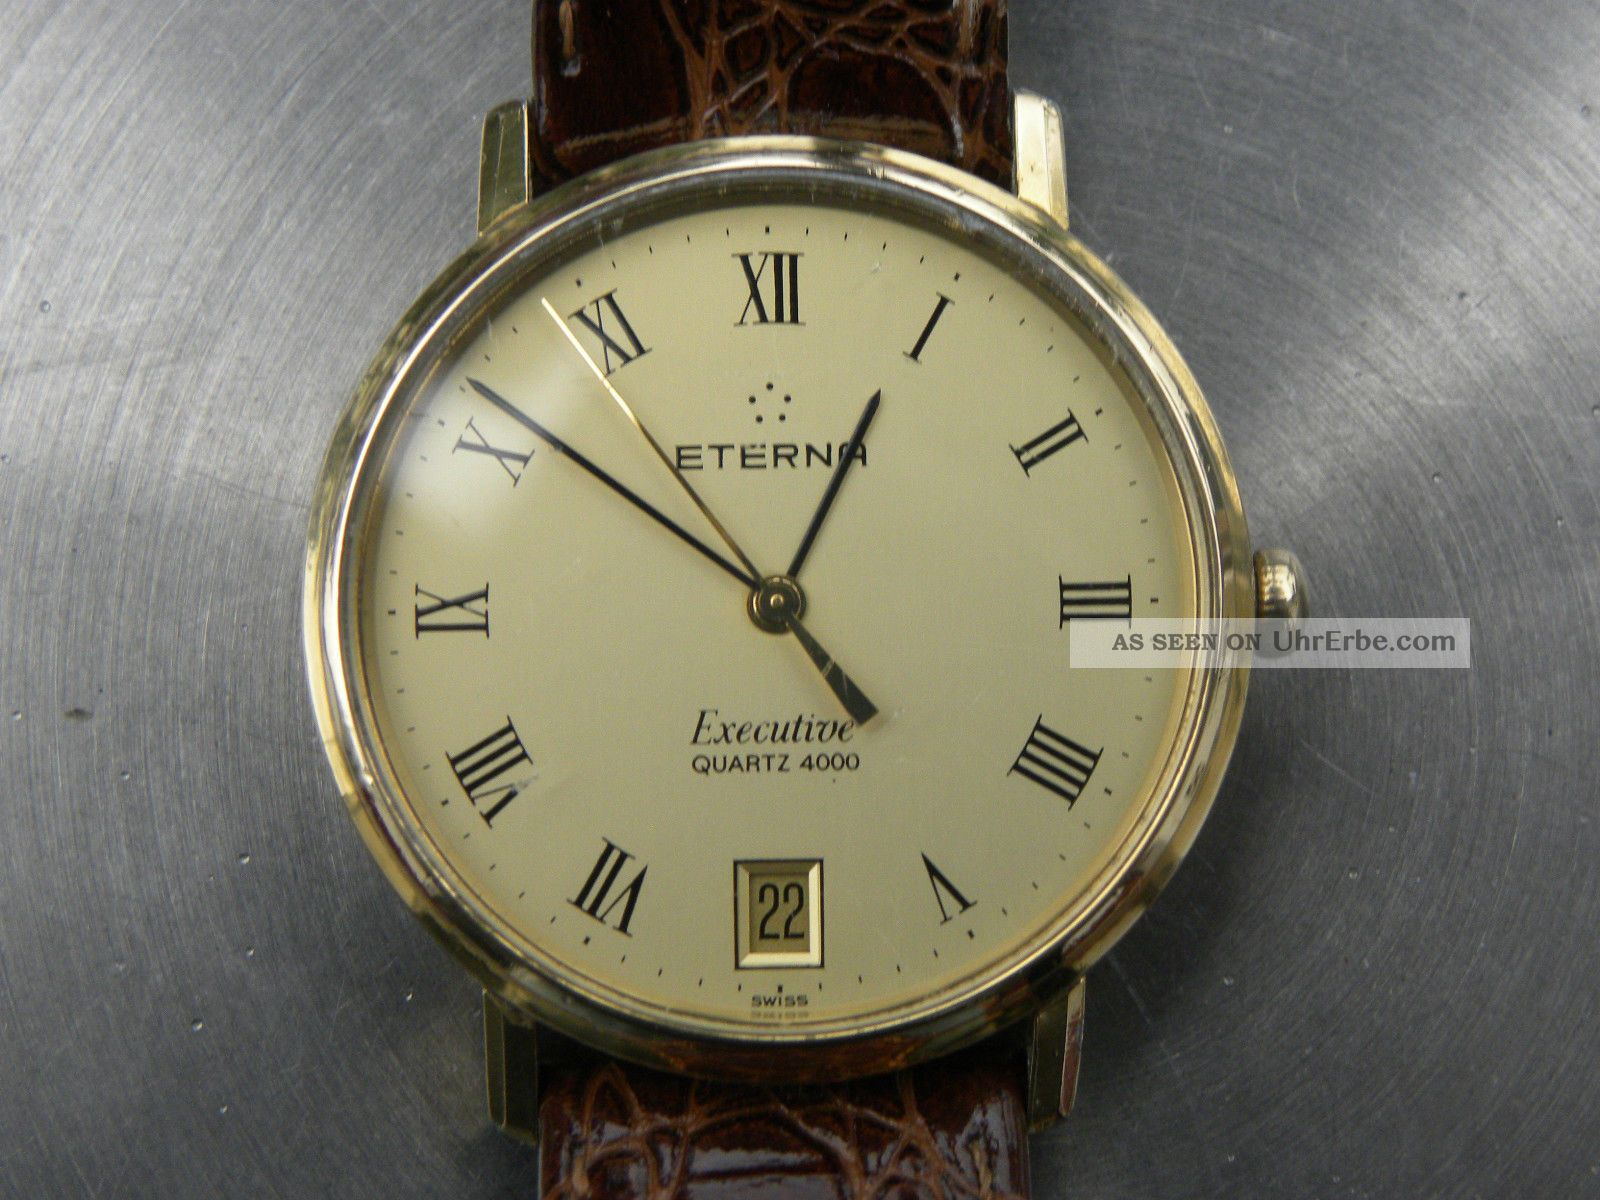 Eterna Executive Swiss Made Armbanduhren Bild